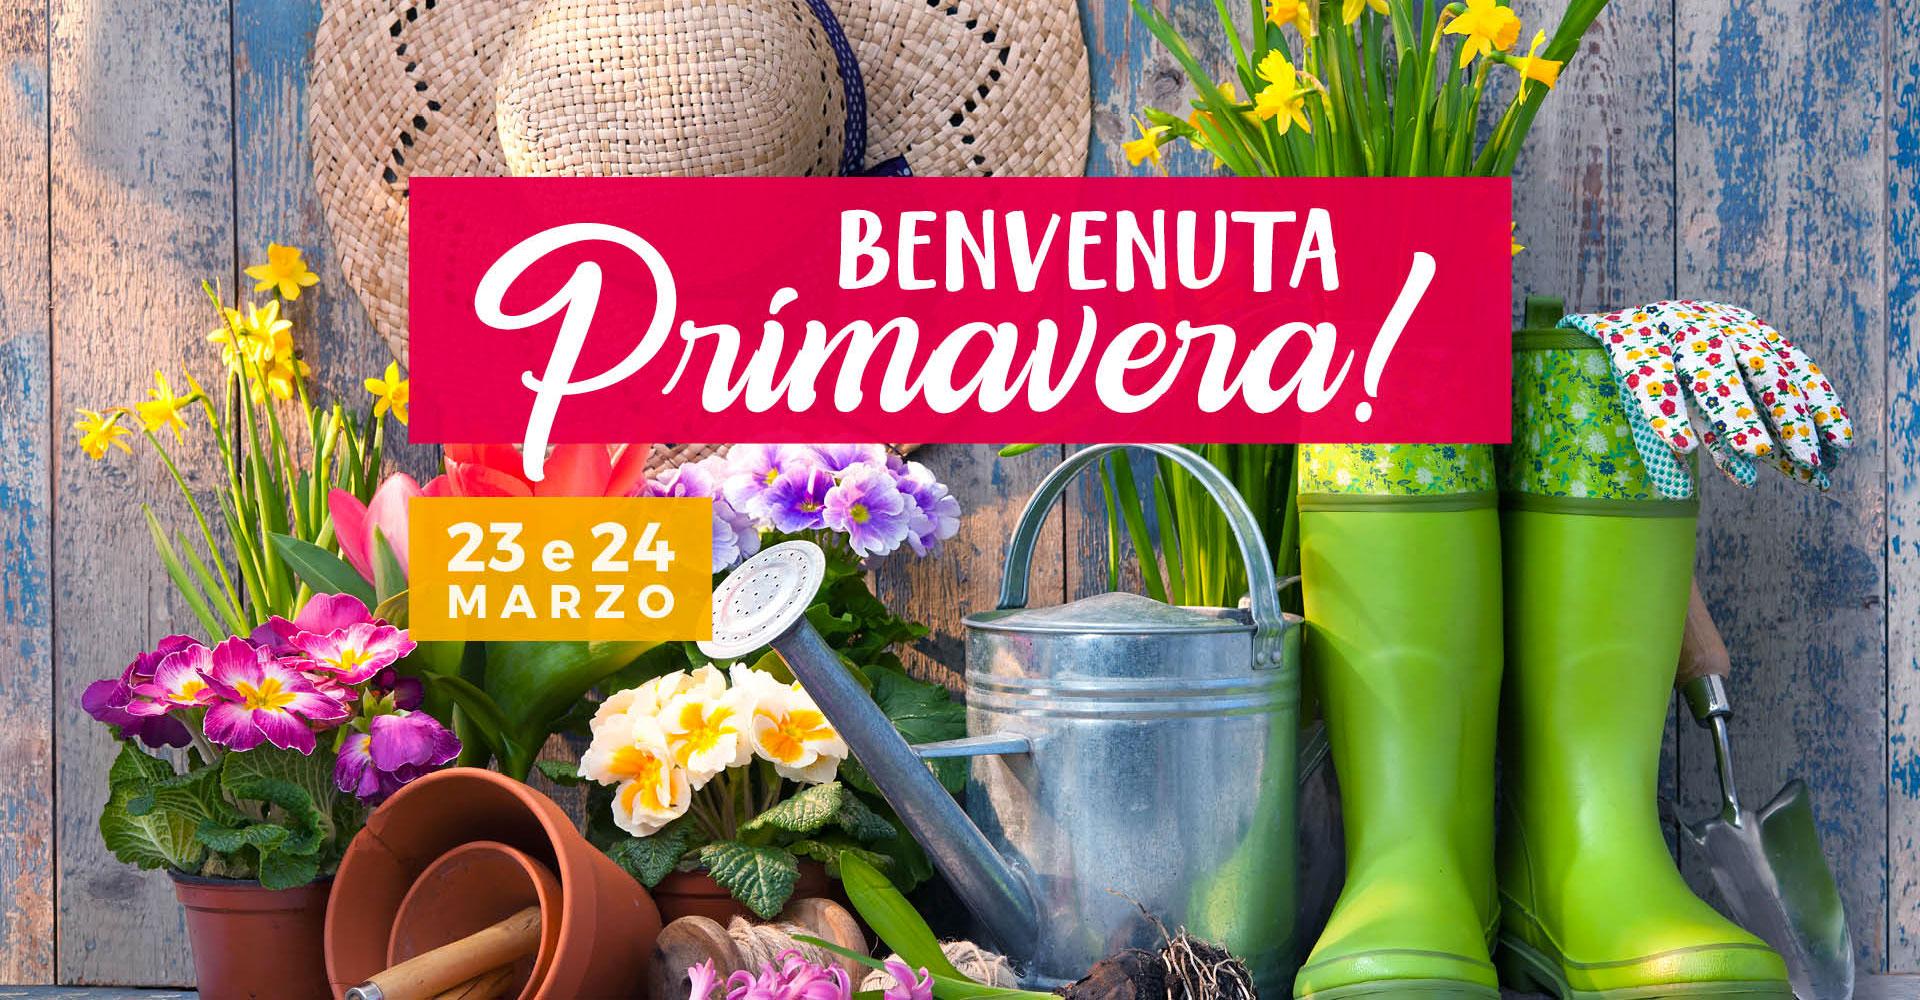 Benvenuta_primavera_centro_giardinaggio_pellegrini